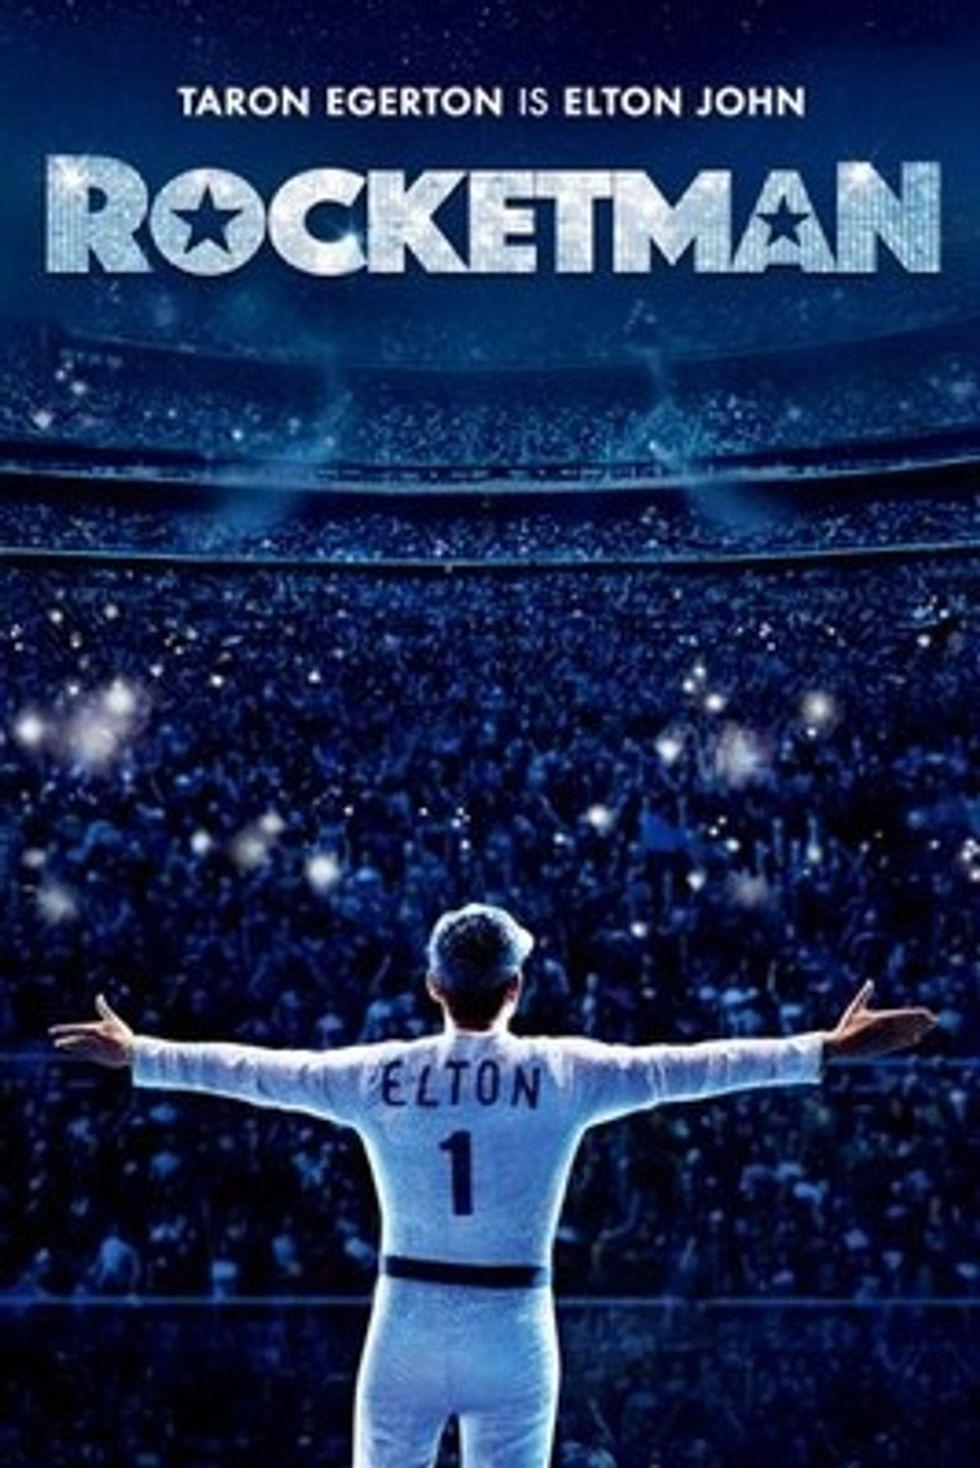 Rocketman Through My Eyes: More Than a Biopic